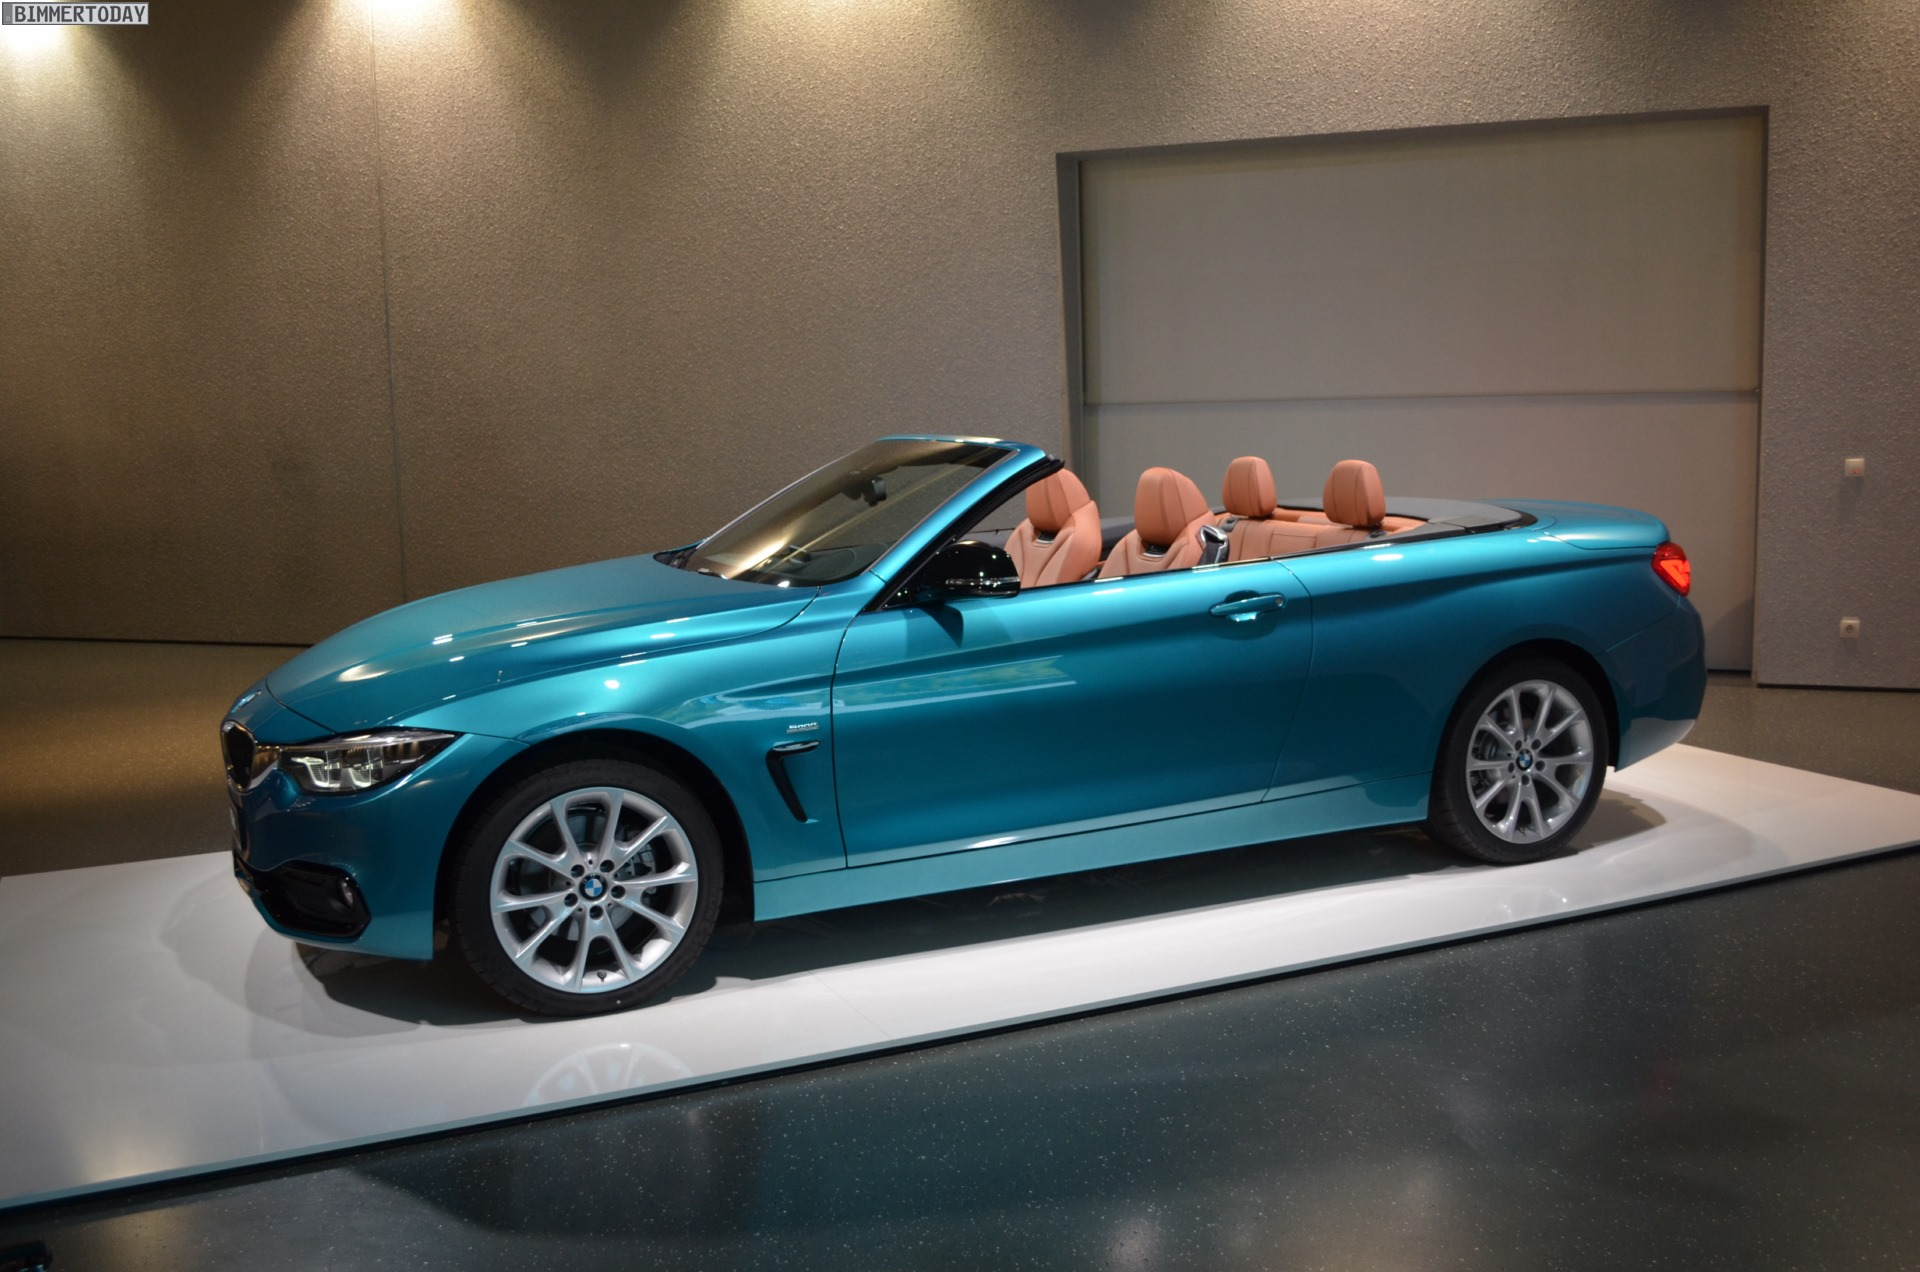 BMW 4er Cabrio Facelift 2017 Snapper Rocks Blue Sport Line F33 LCI 15